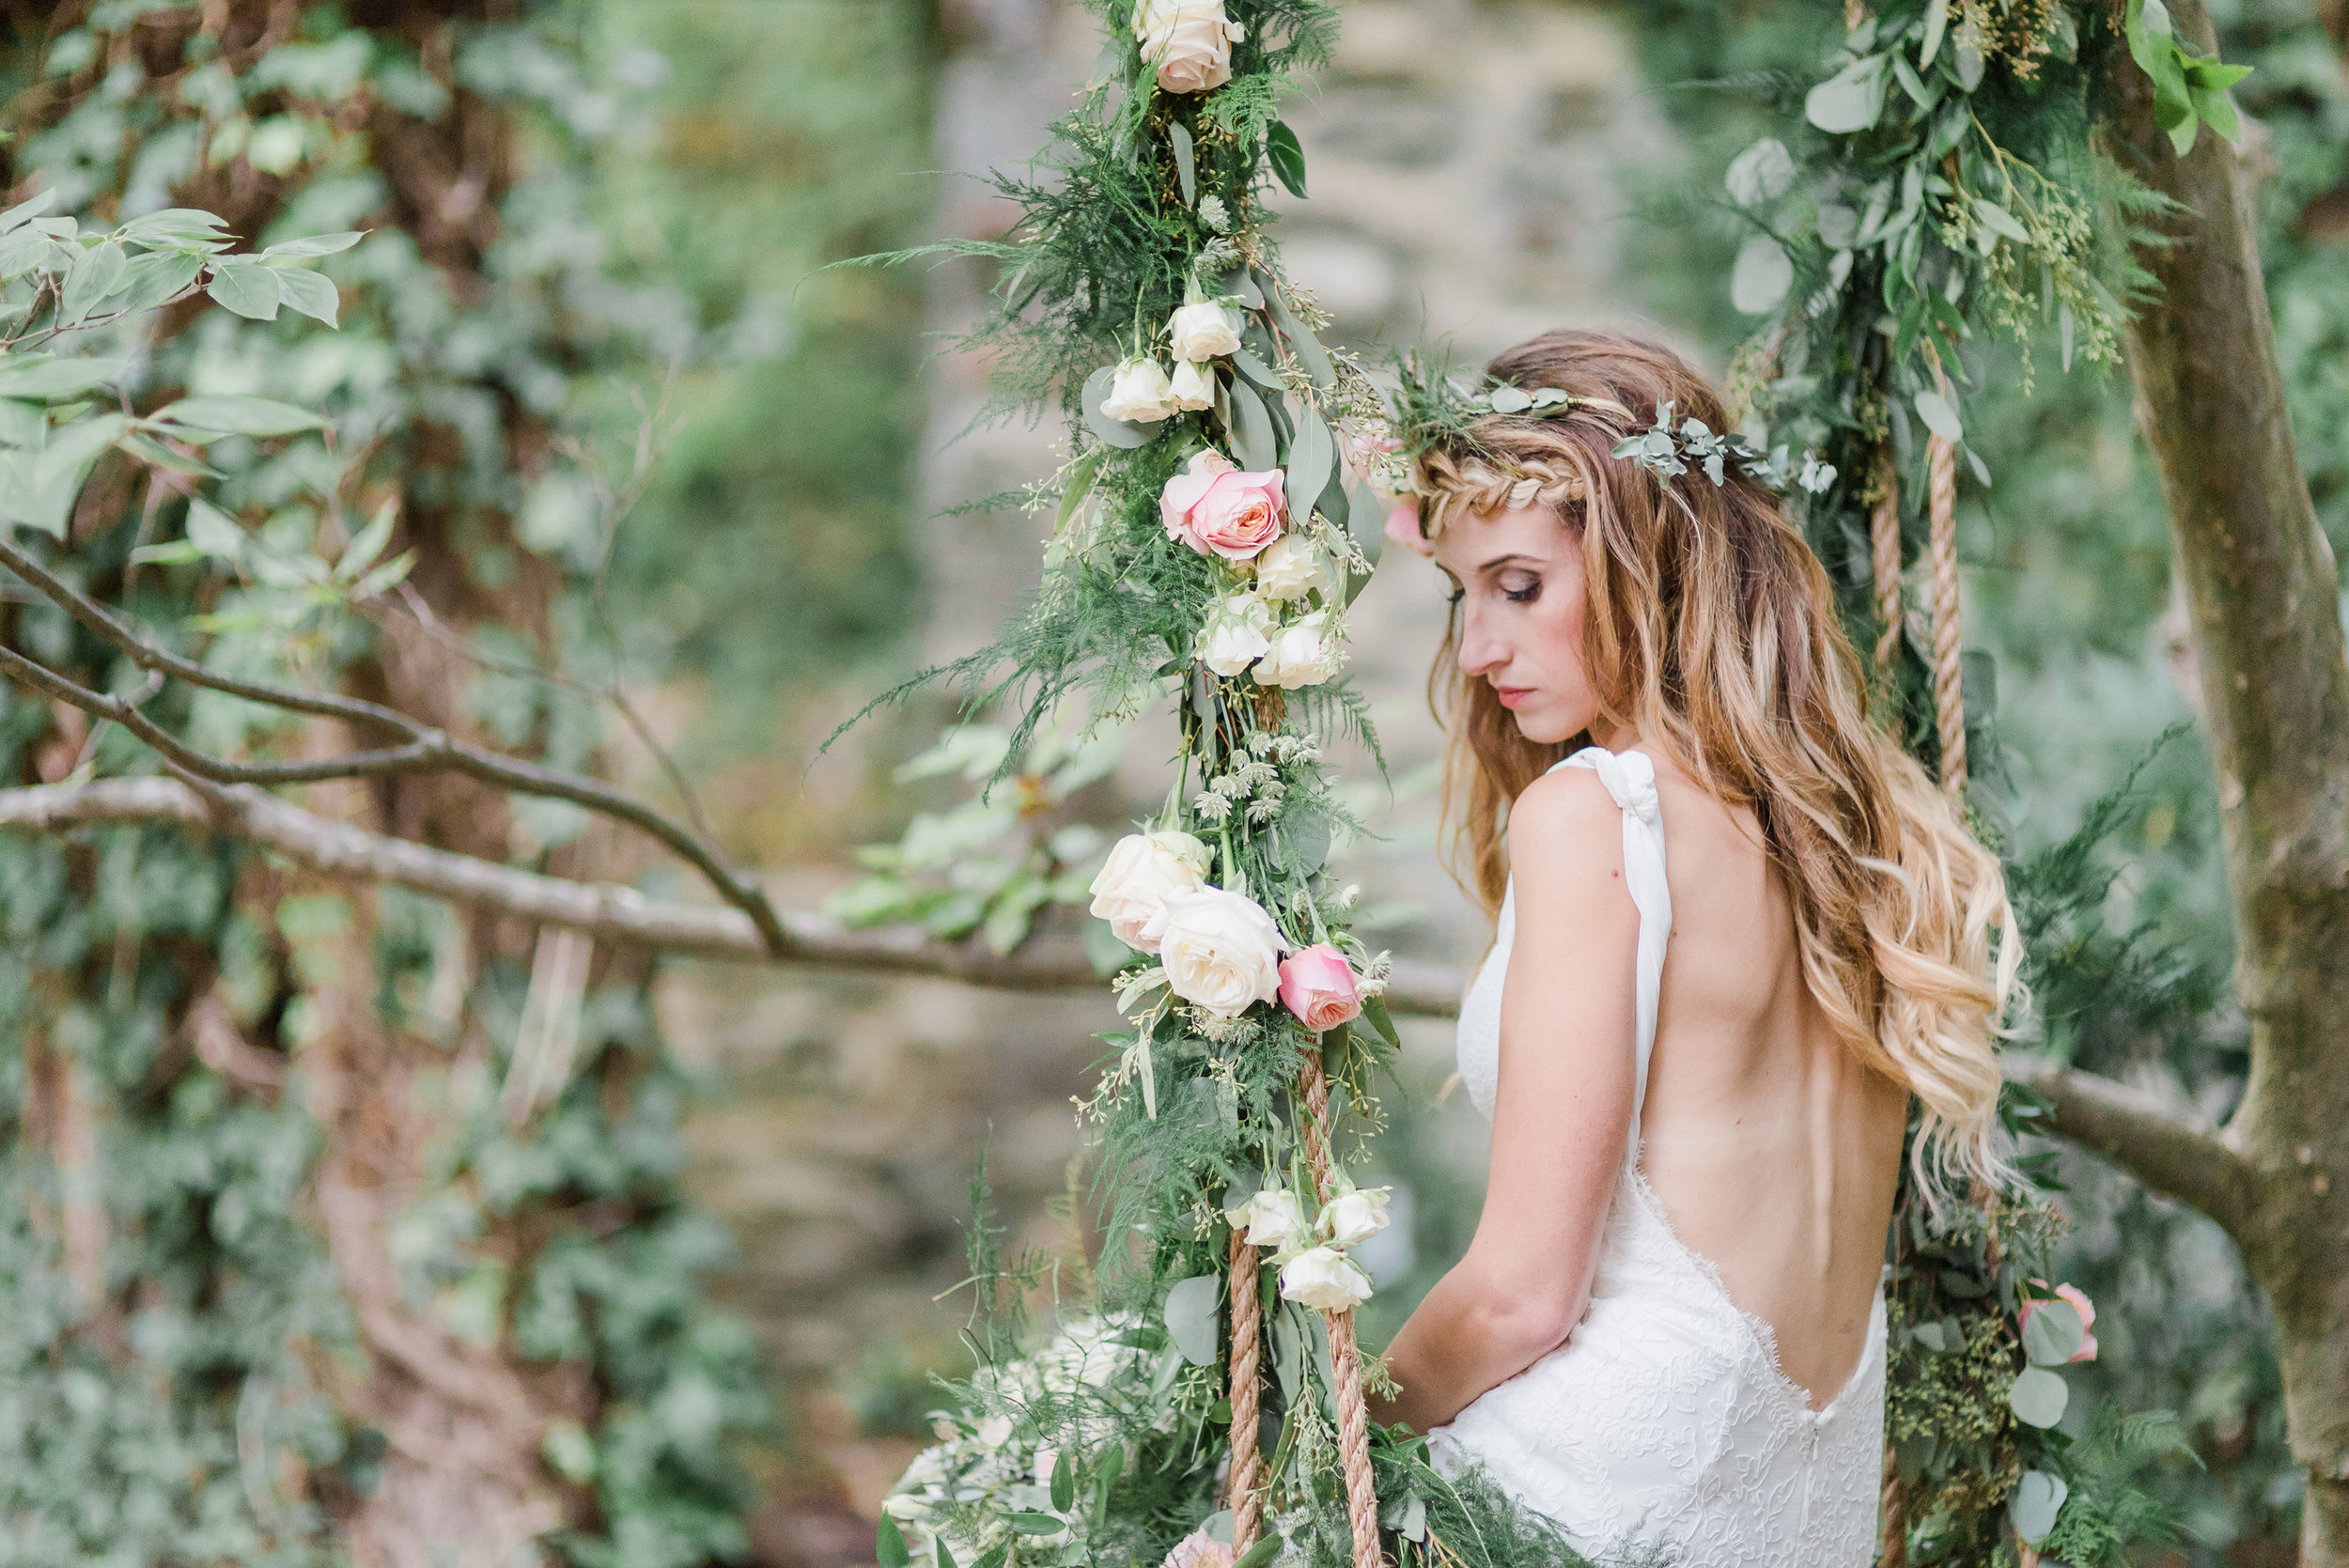 Blush Romantic Shoot Details-0287 - Copy.jpg